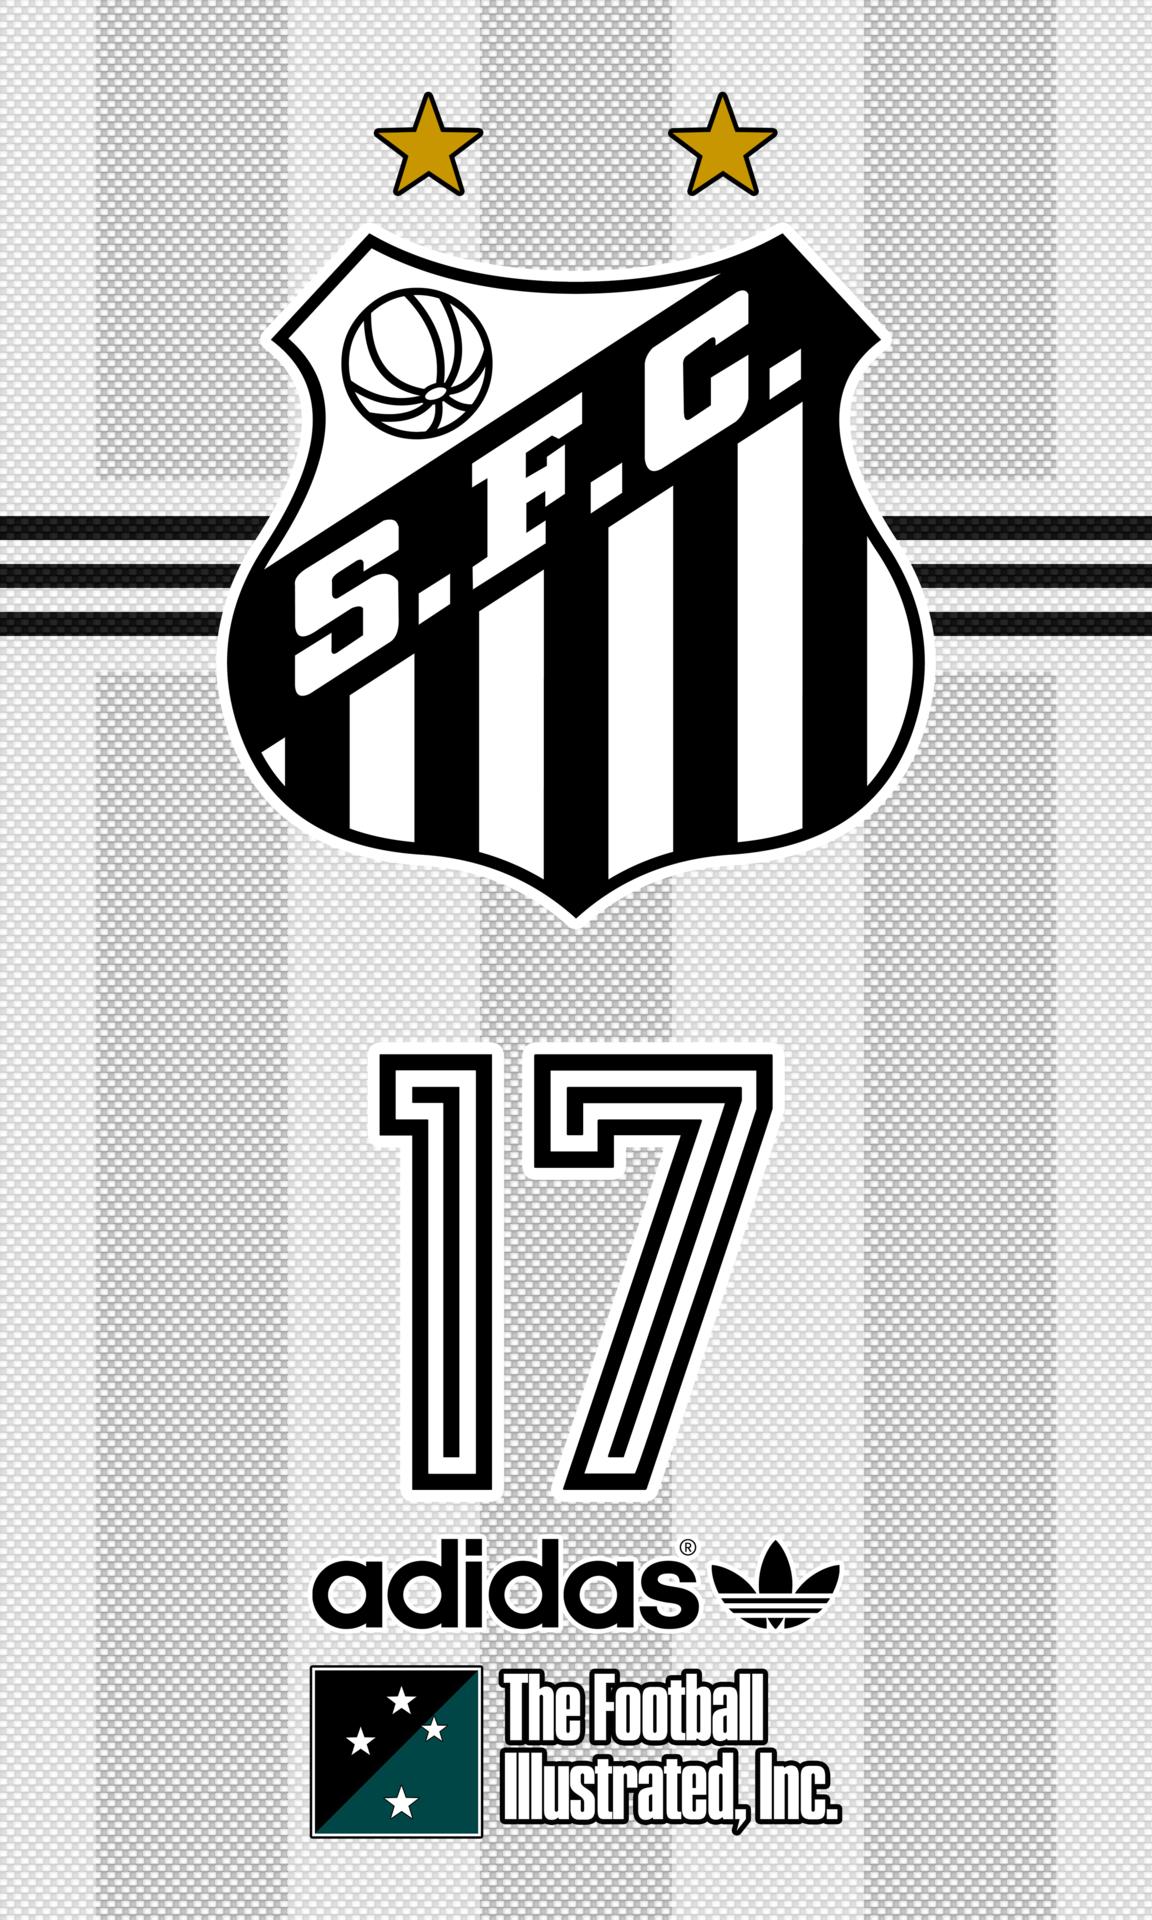 santos futebol clube wallpaper 1152x1920